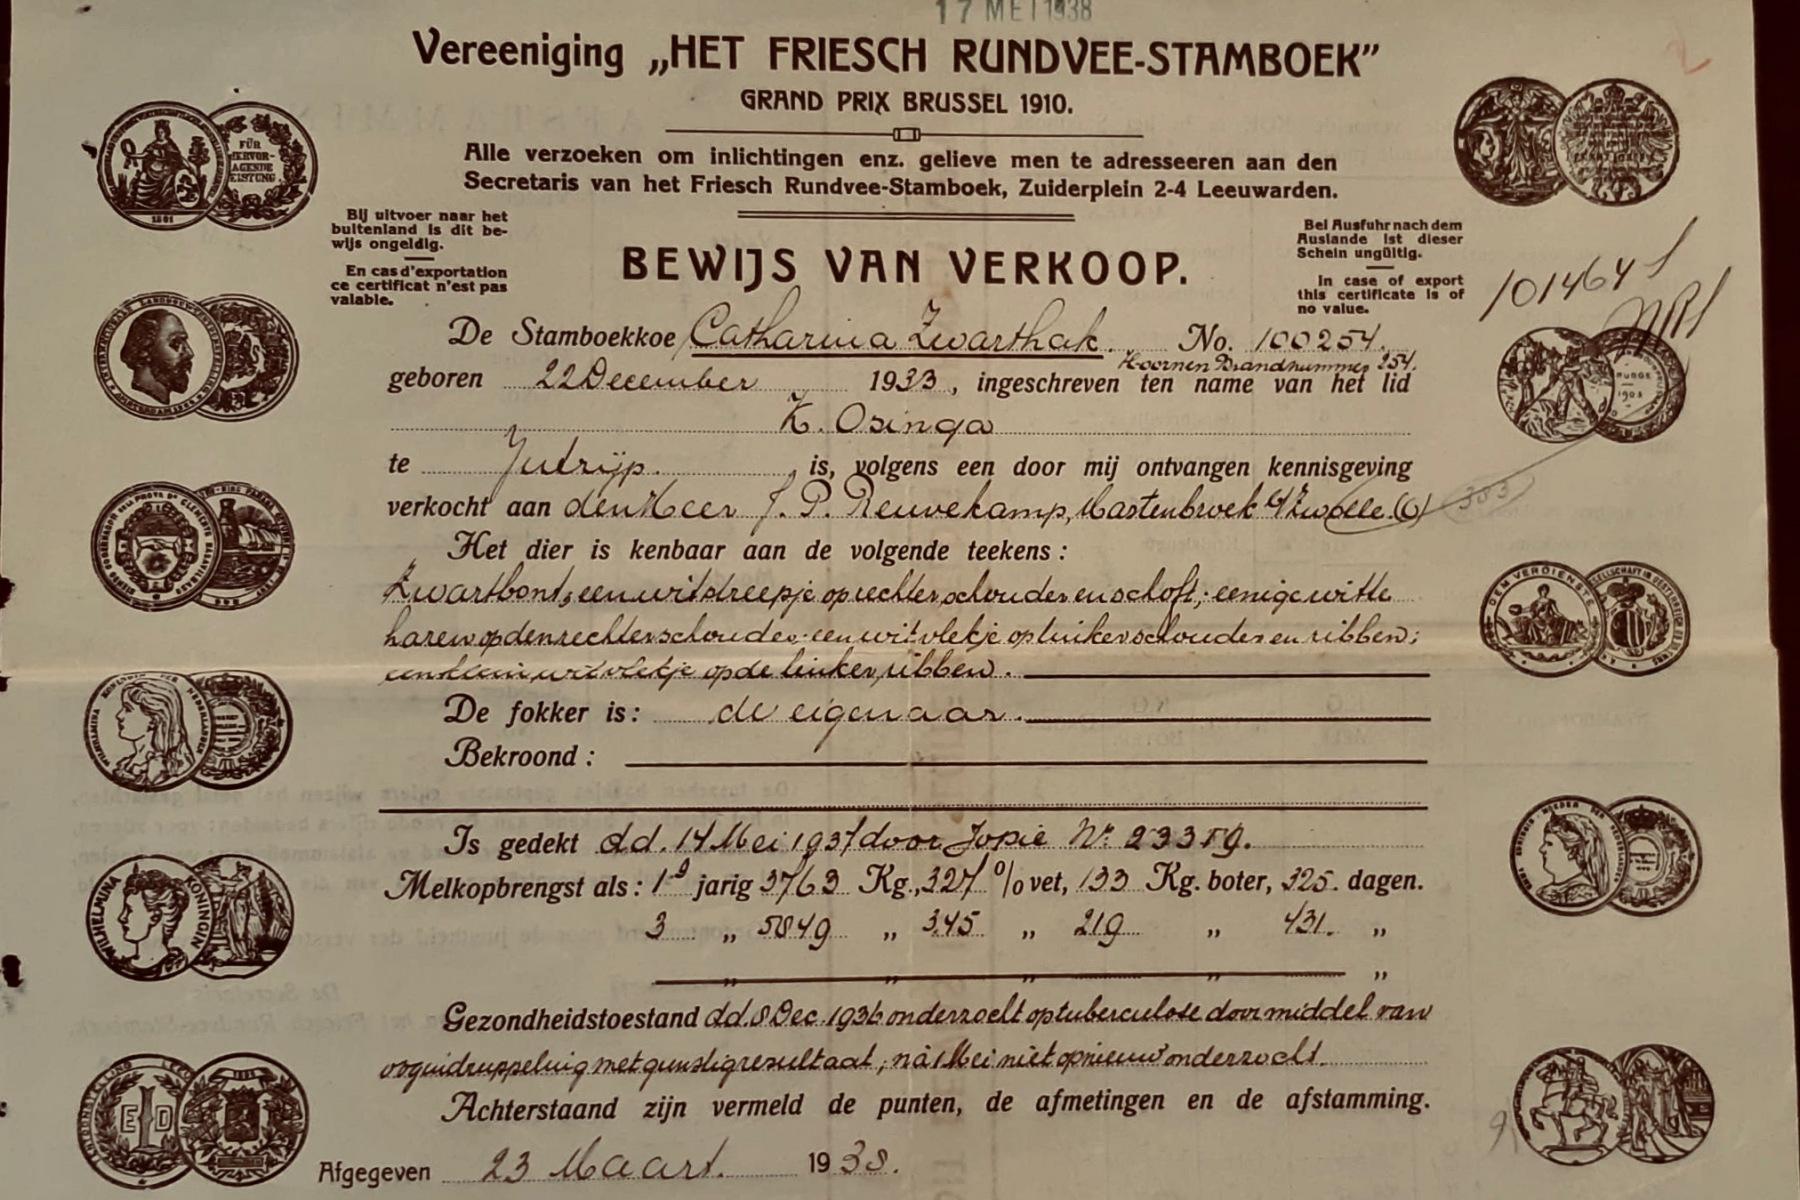 Jans koopt stamboekkoe  Catharina Zwarthak van K. Osinga uit Jutrijp (1938).